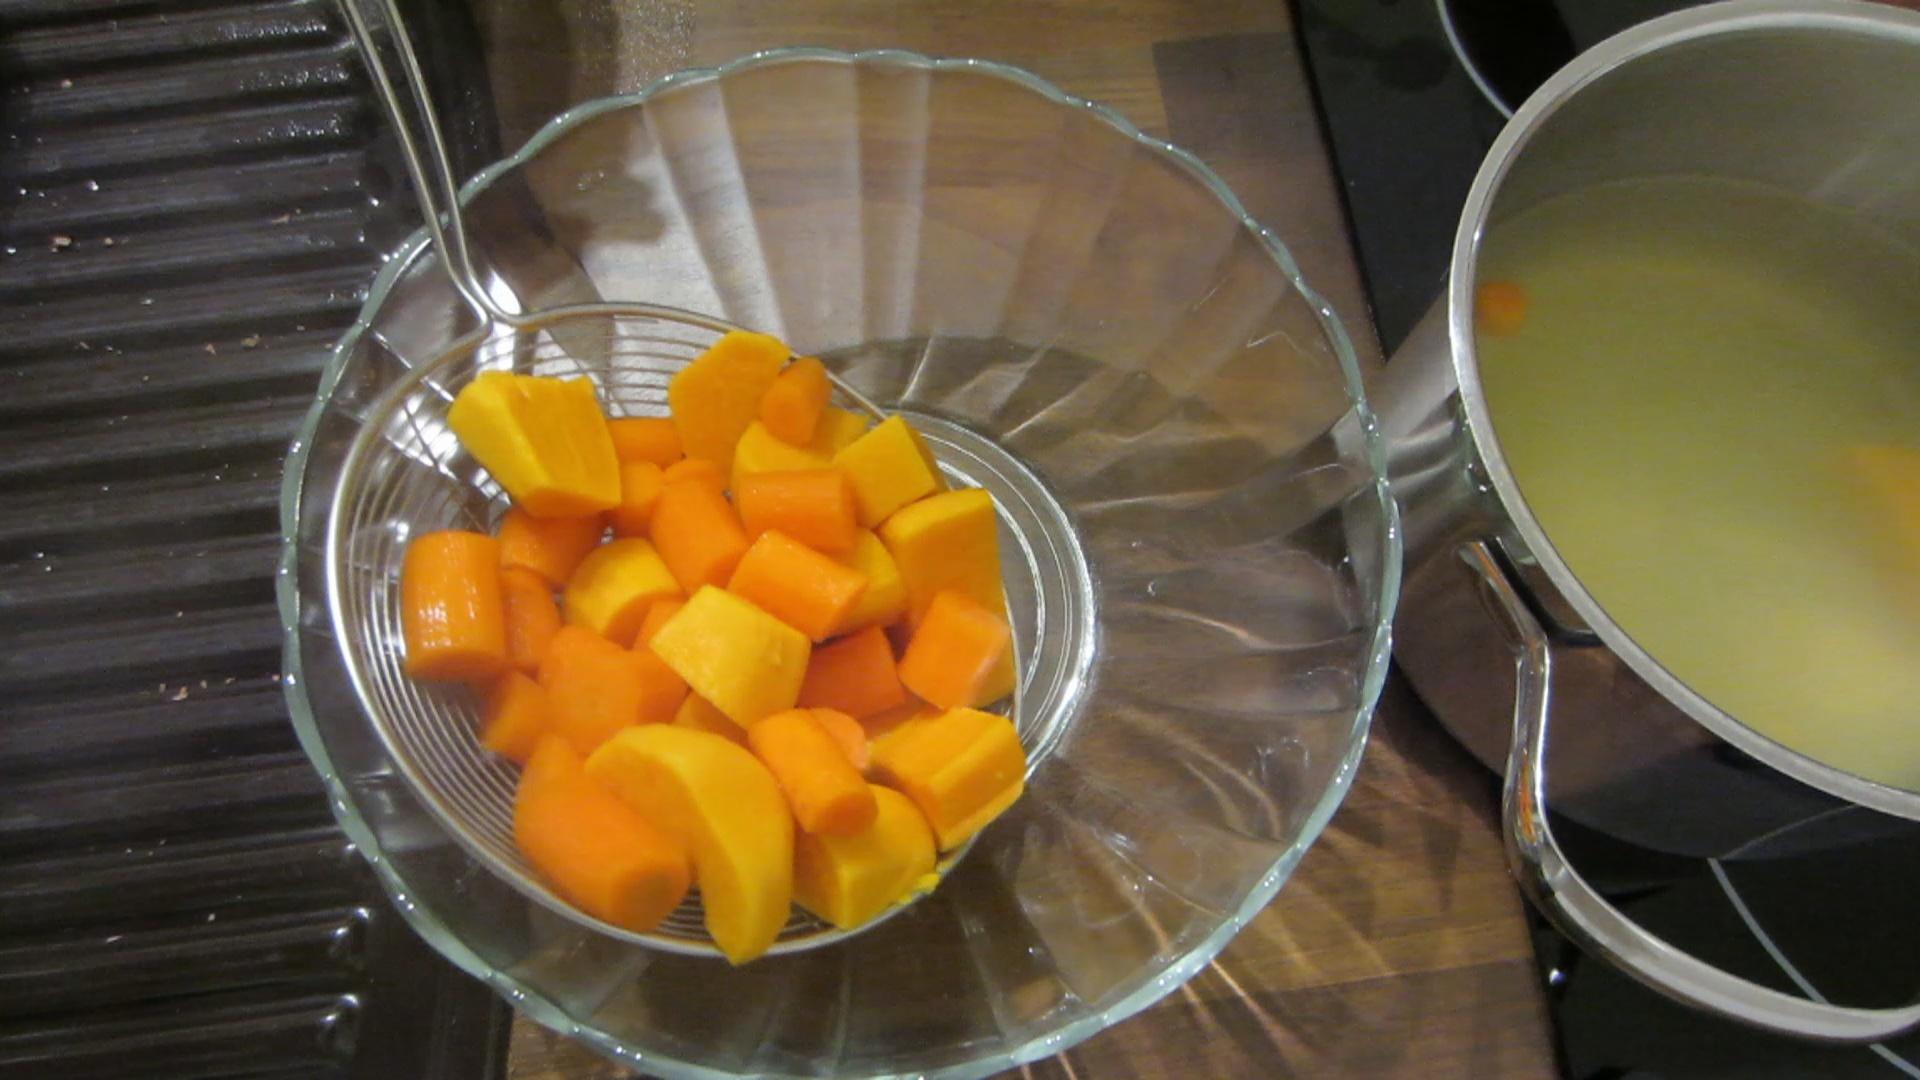 2014-04-11-Sweet-potato-carrot-mash-11.jpg